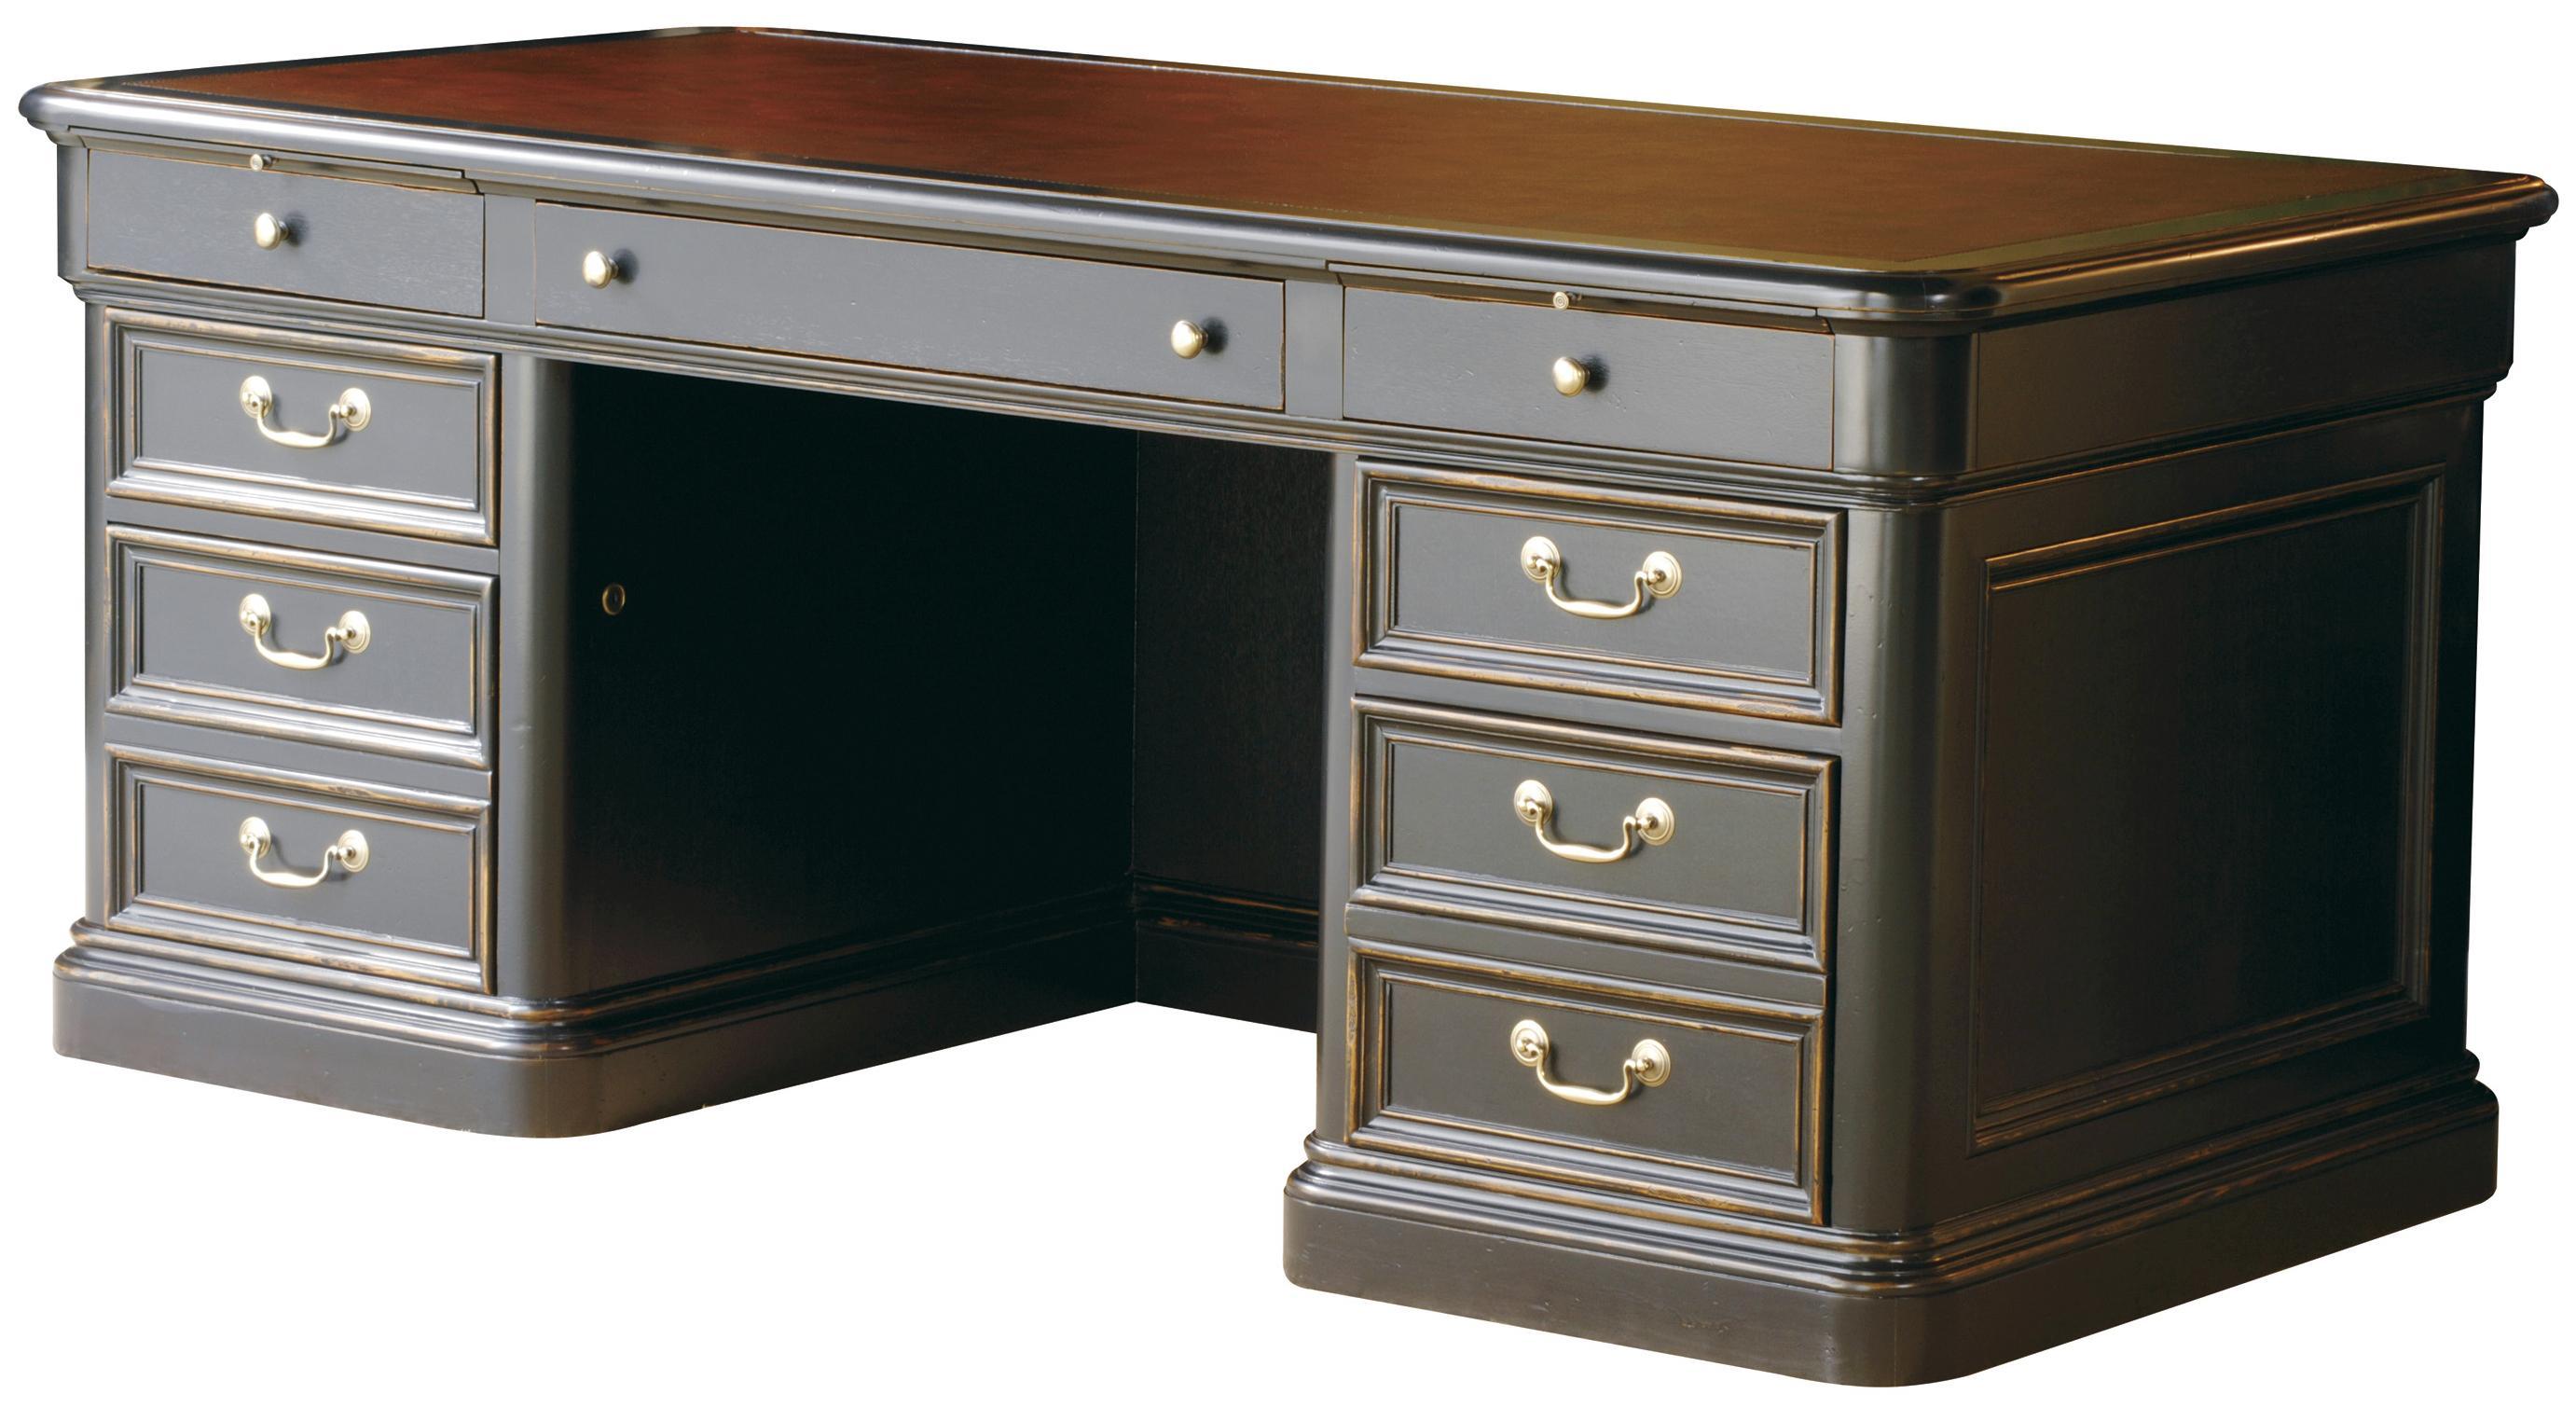 Hekman 7 9100 Double Pedestal Executive Desk